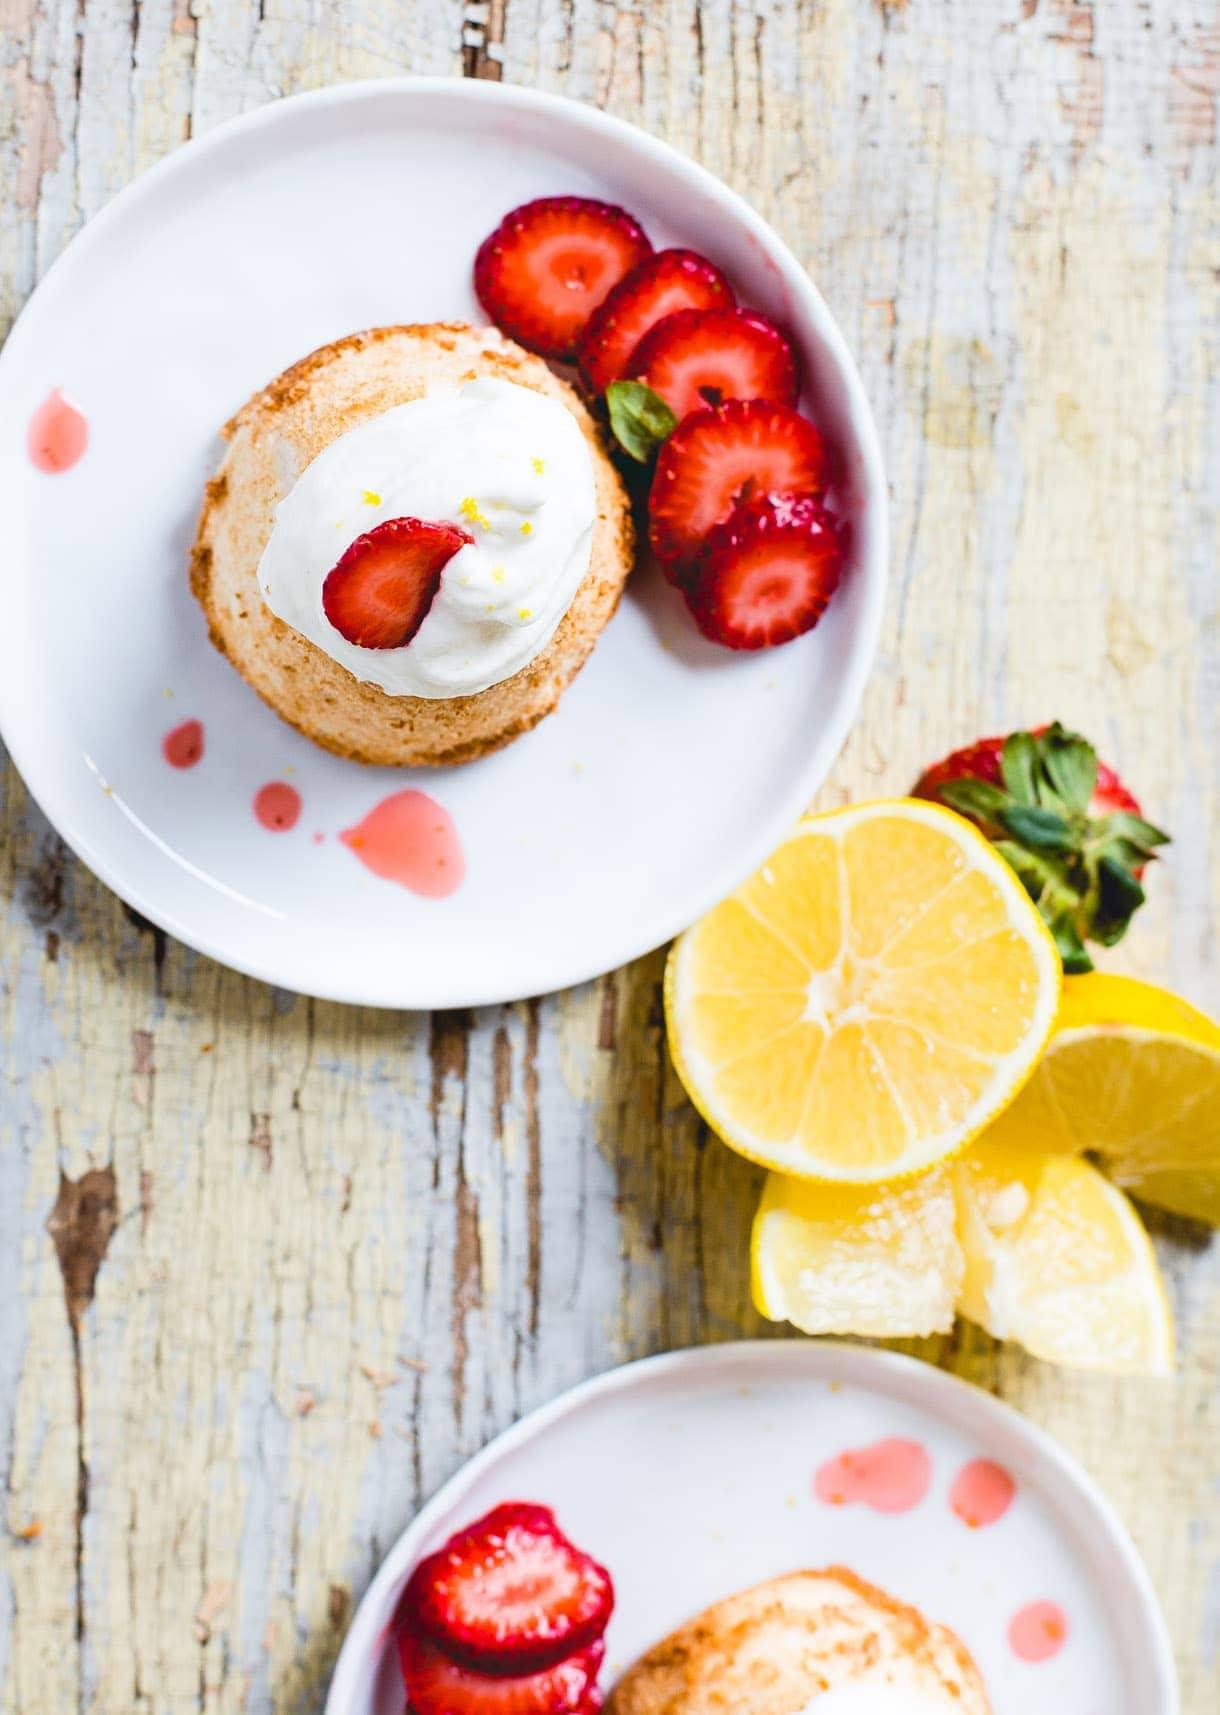 Grain-Free, Gluten-Free Angel Food Cake with Lemon Whipped Cream & Strawberries